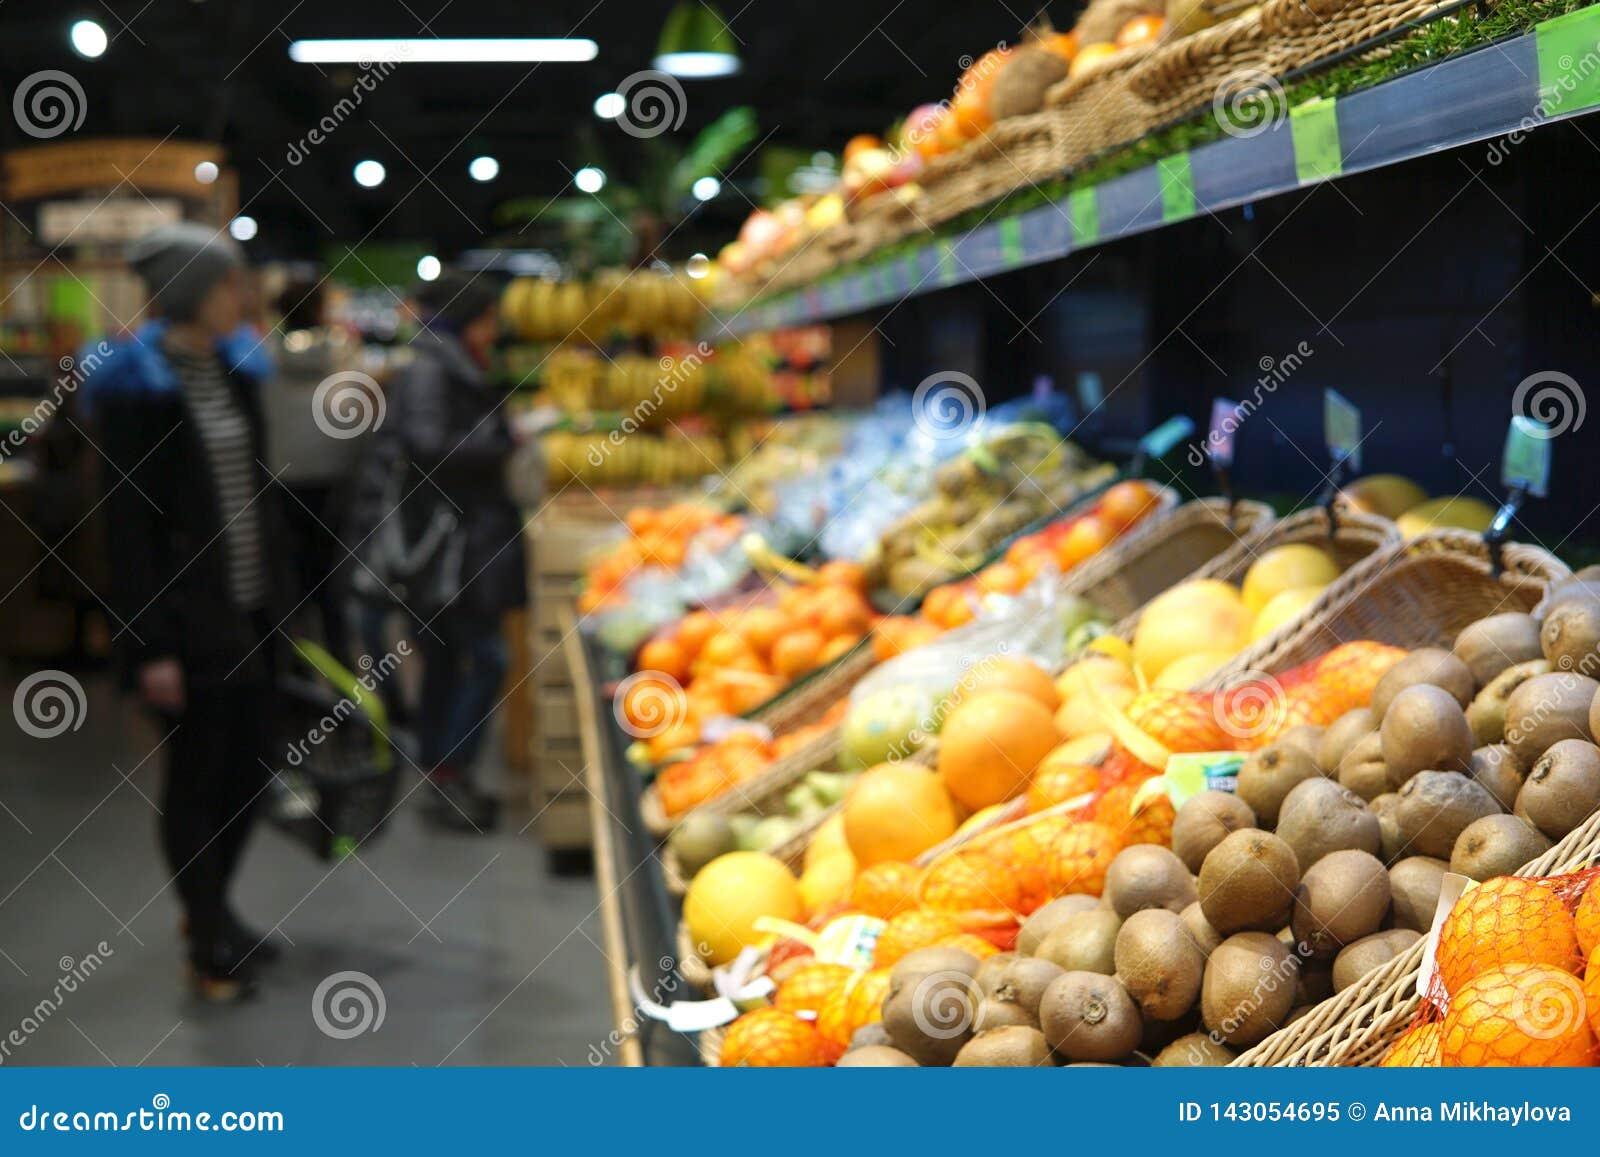 Owoce Zamazany wizerunek supermarket